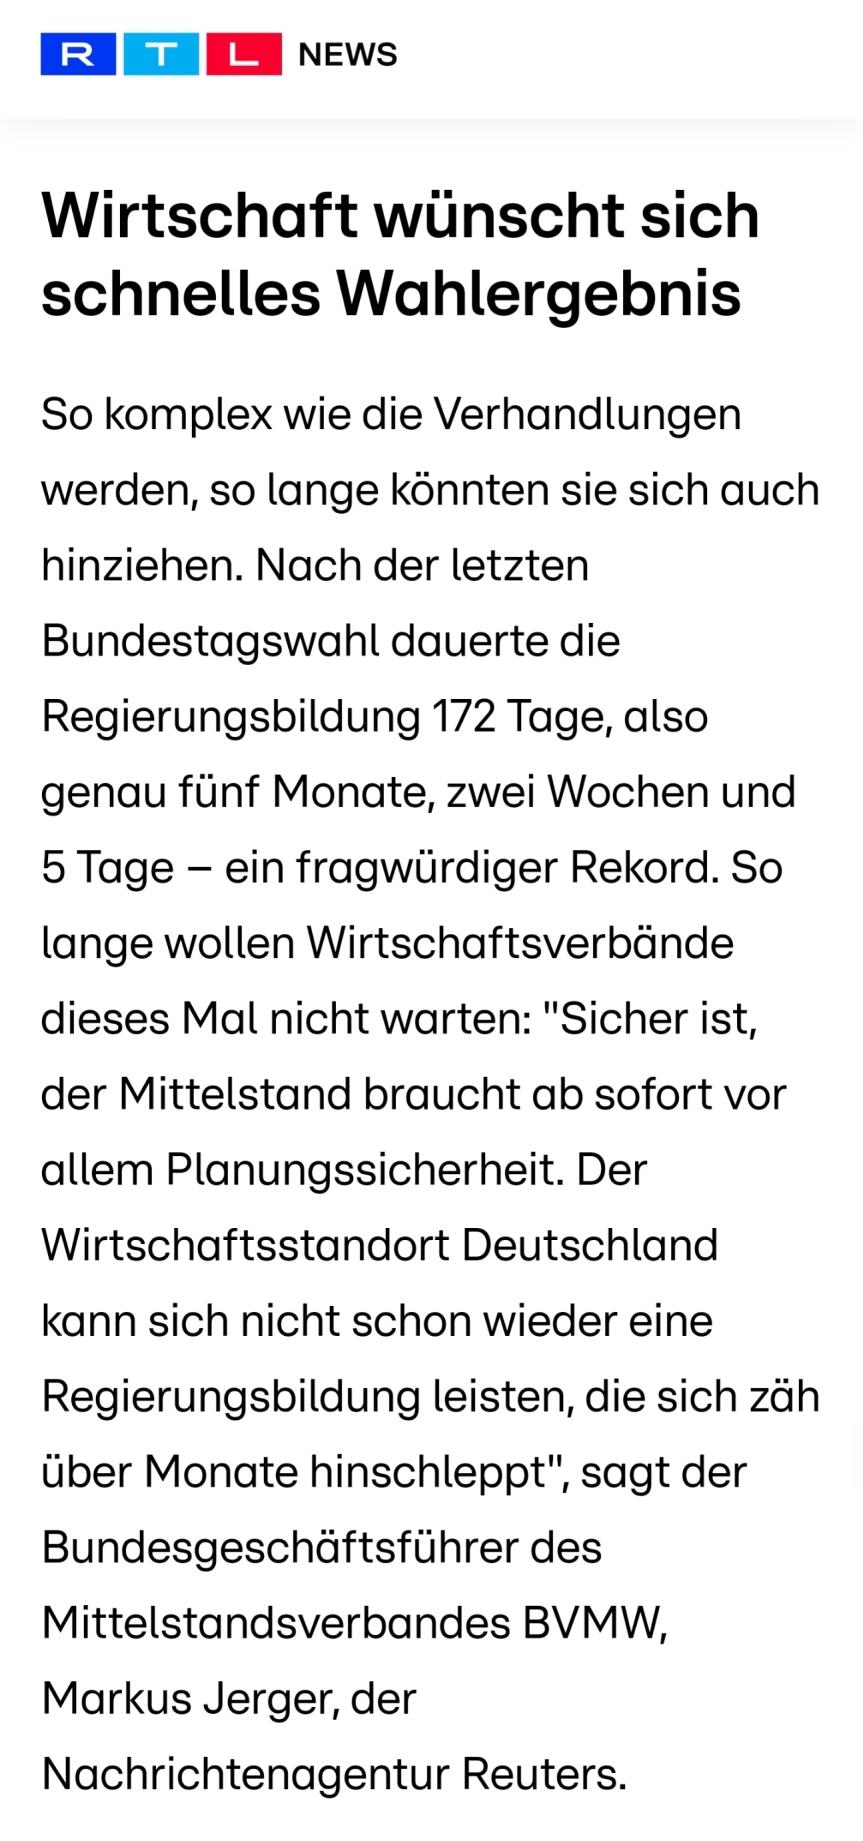 RTL NEWS : MITTELSTANDFORDERT…